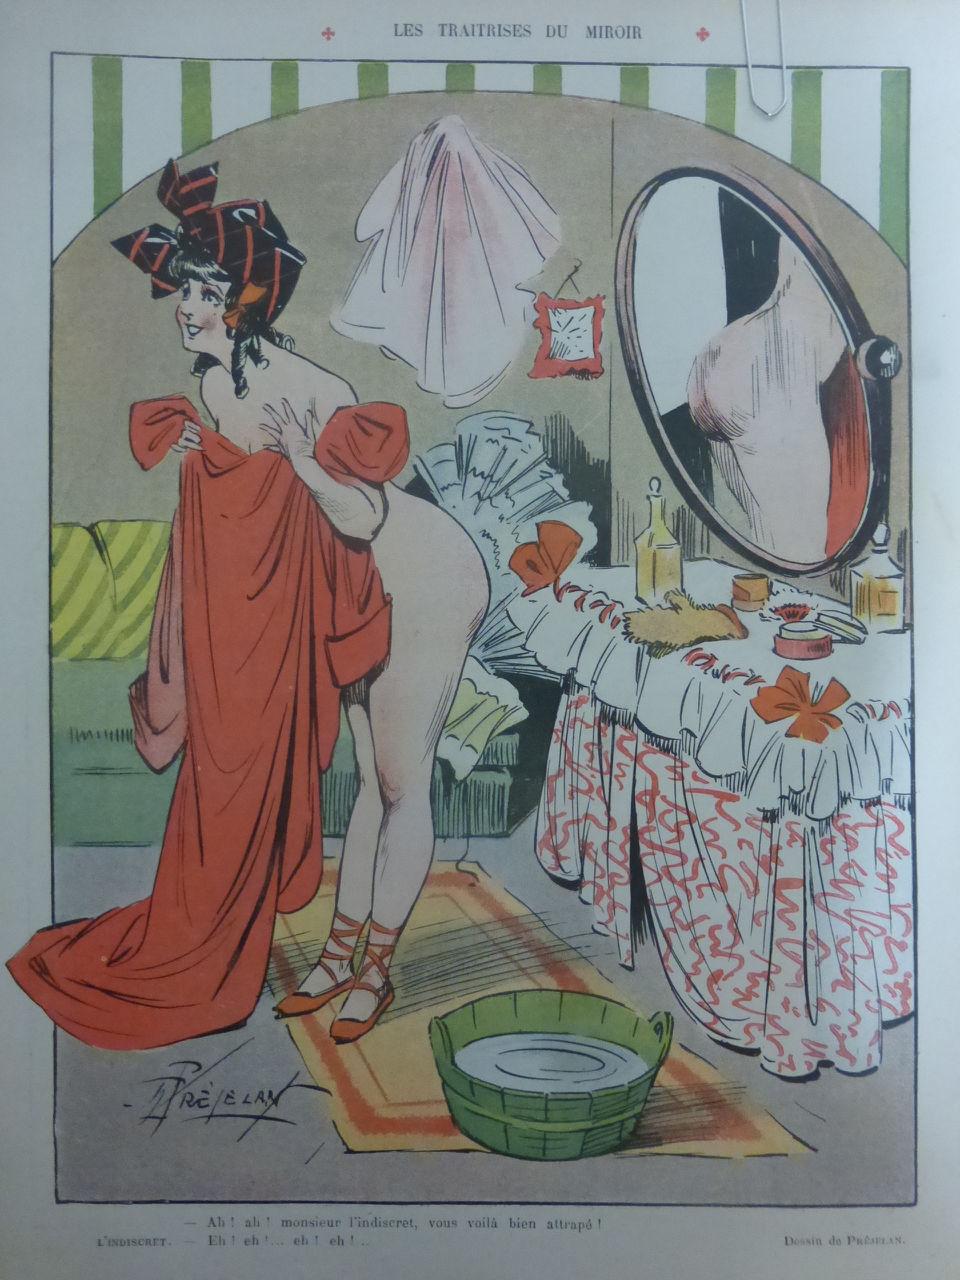 1907 Prejelan Les traitrises dumiroir